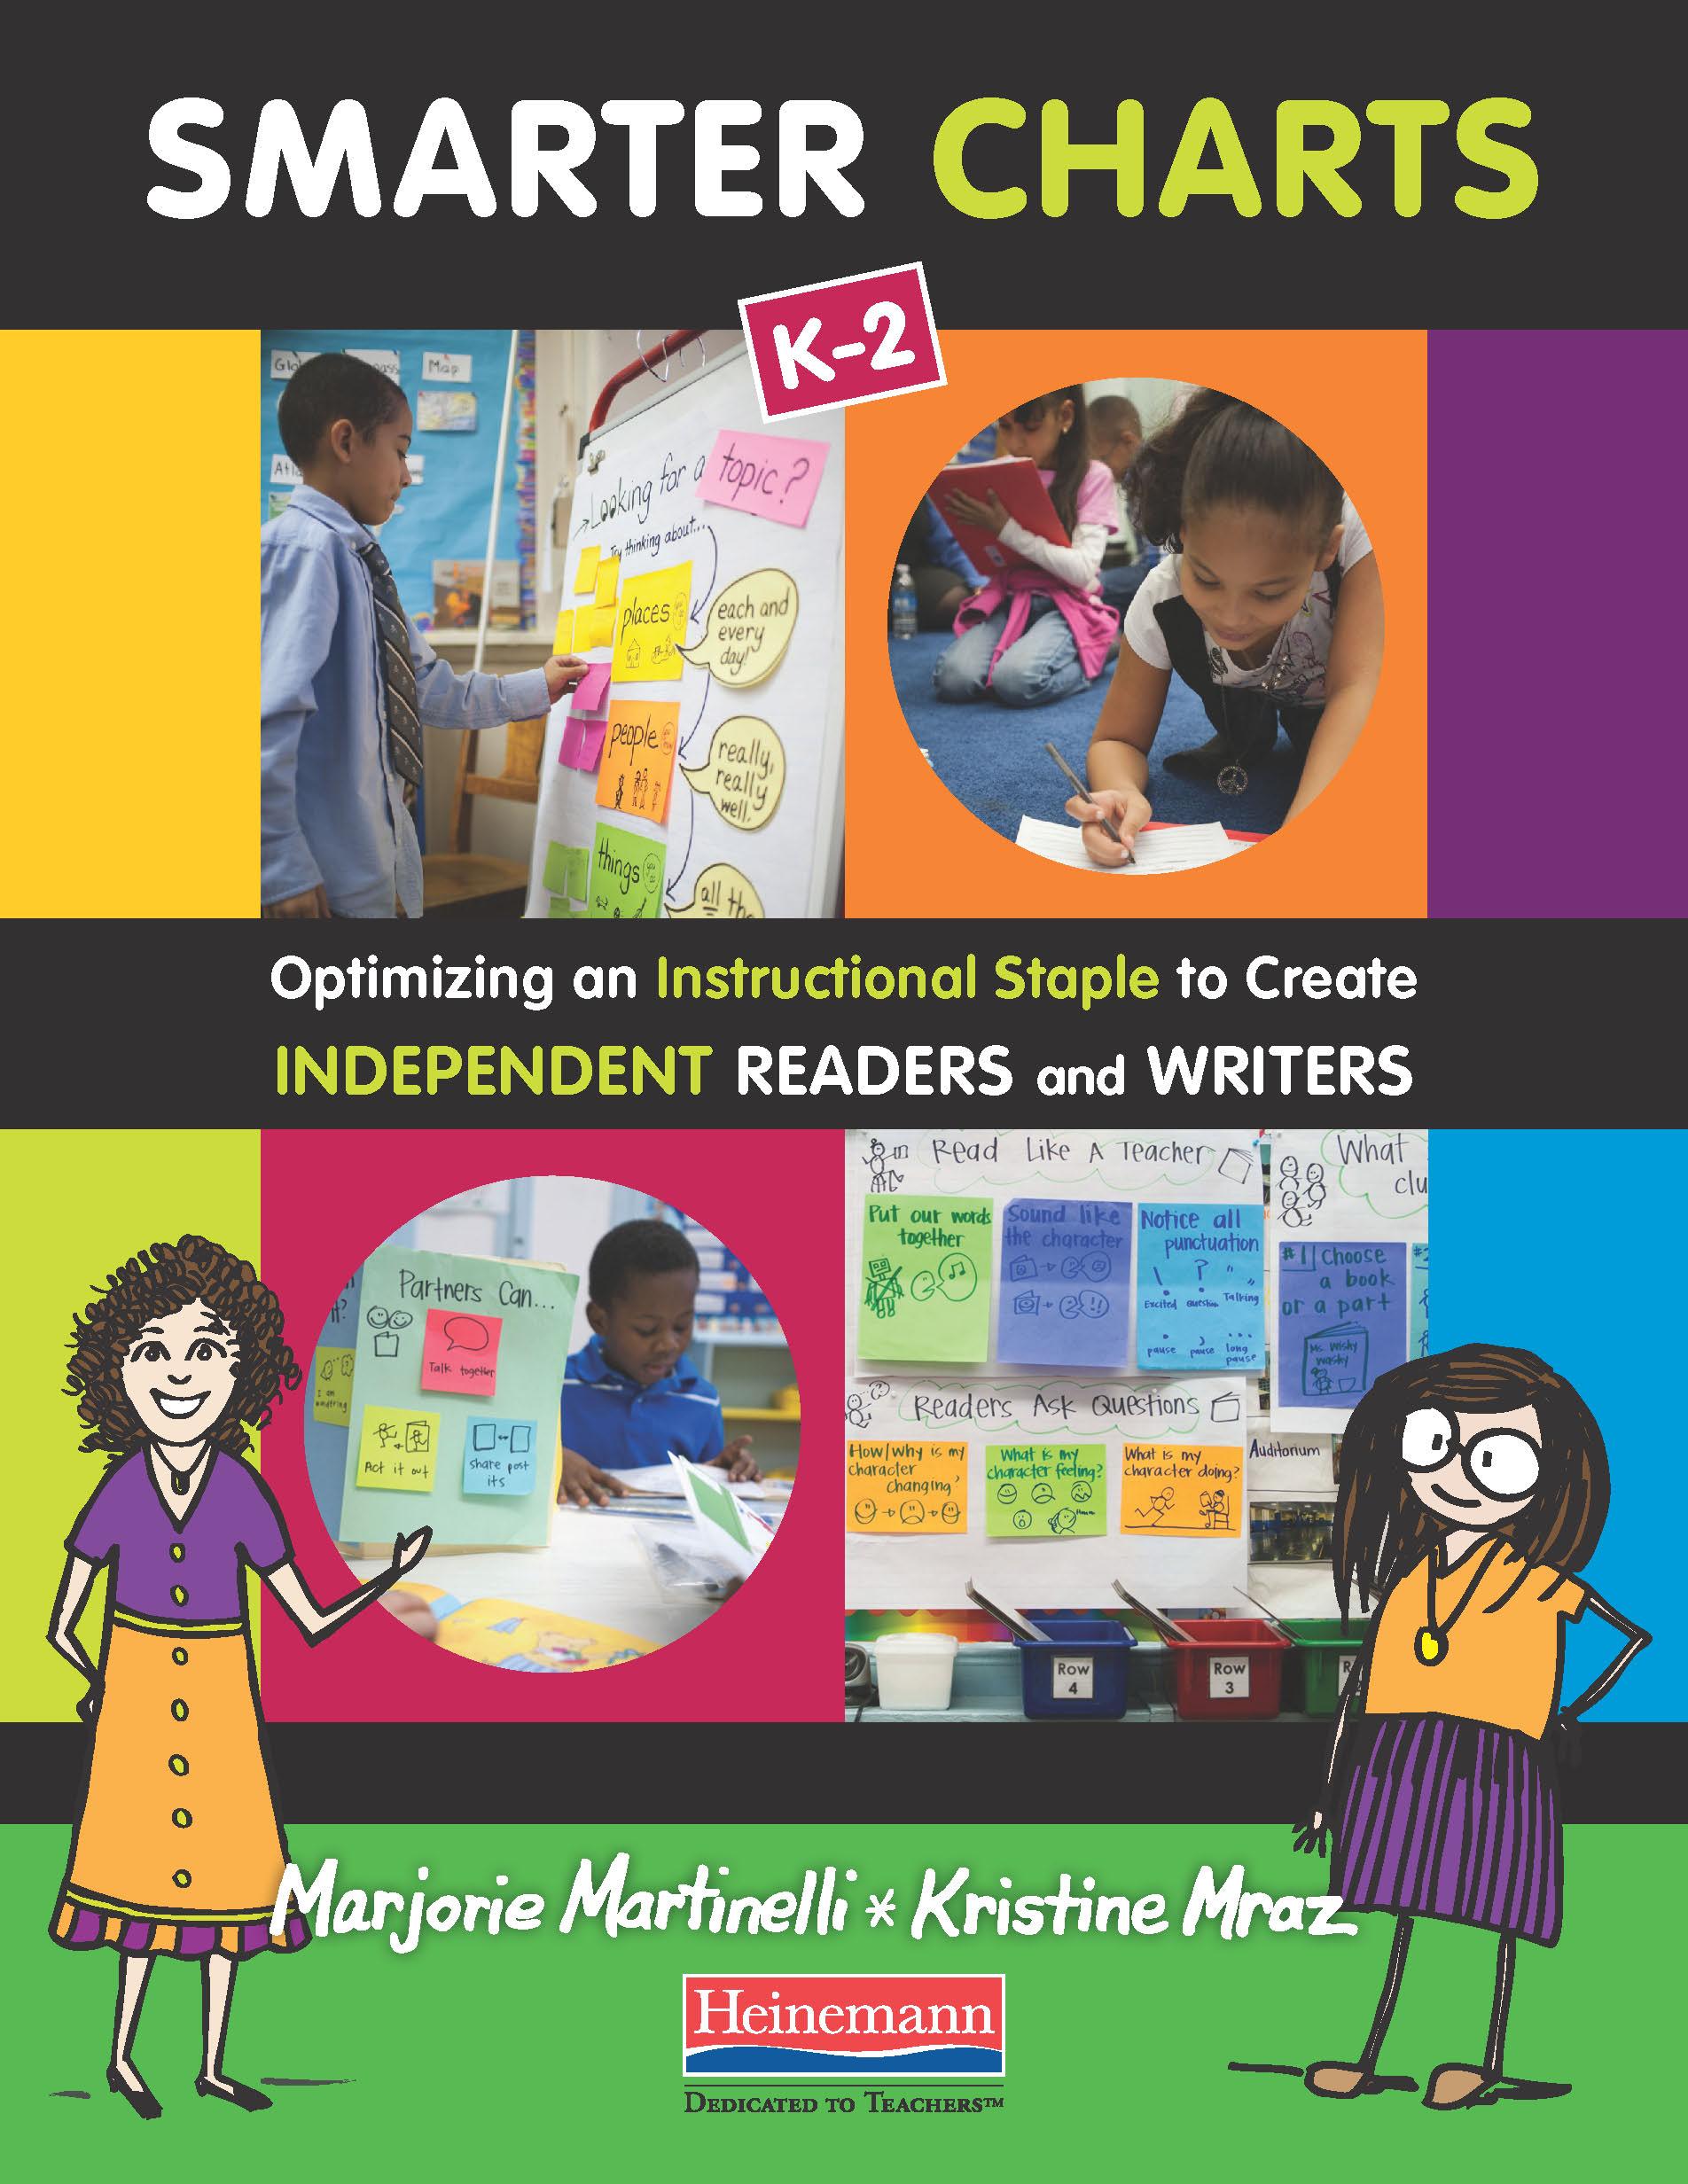 November | 2012 | TWO WRITING TEACHERS | Page 3